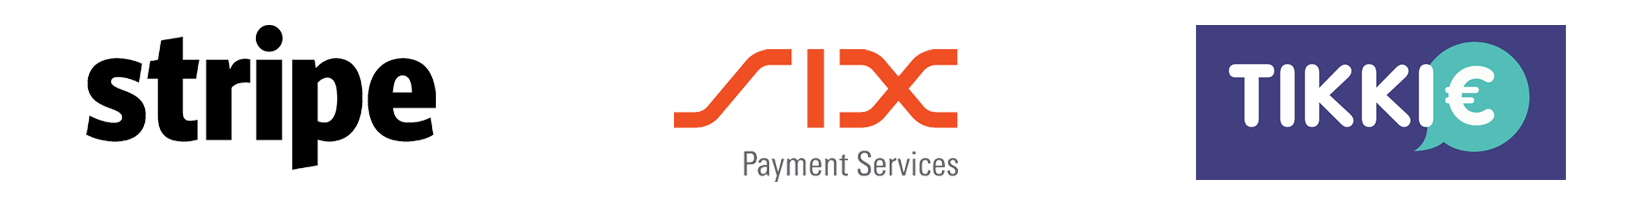 stripe six payment services tikkie